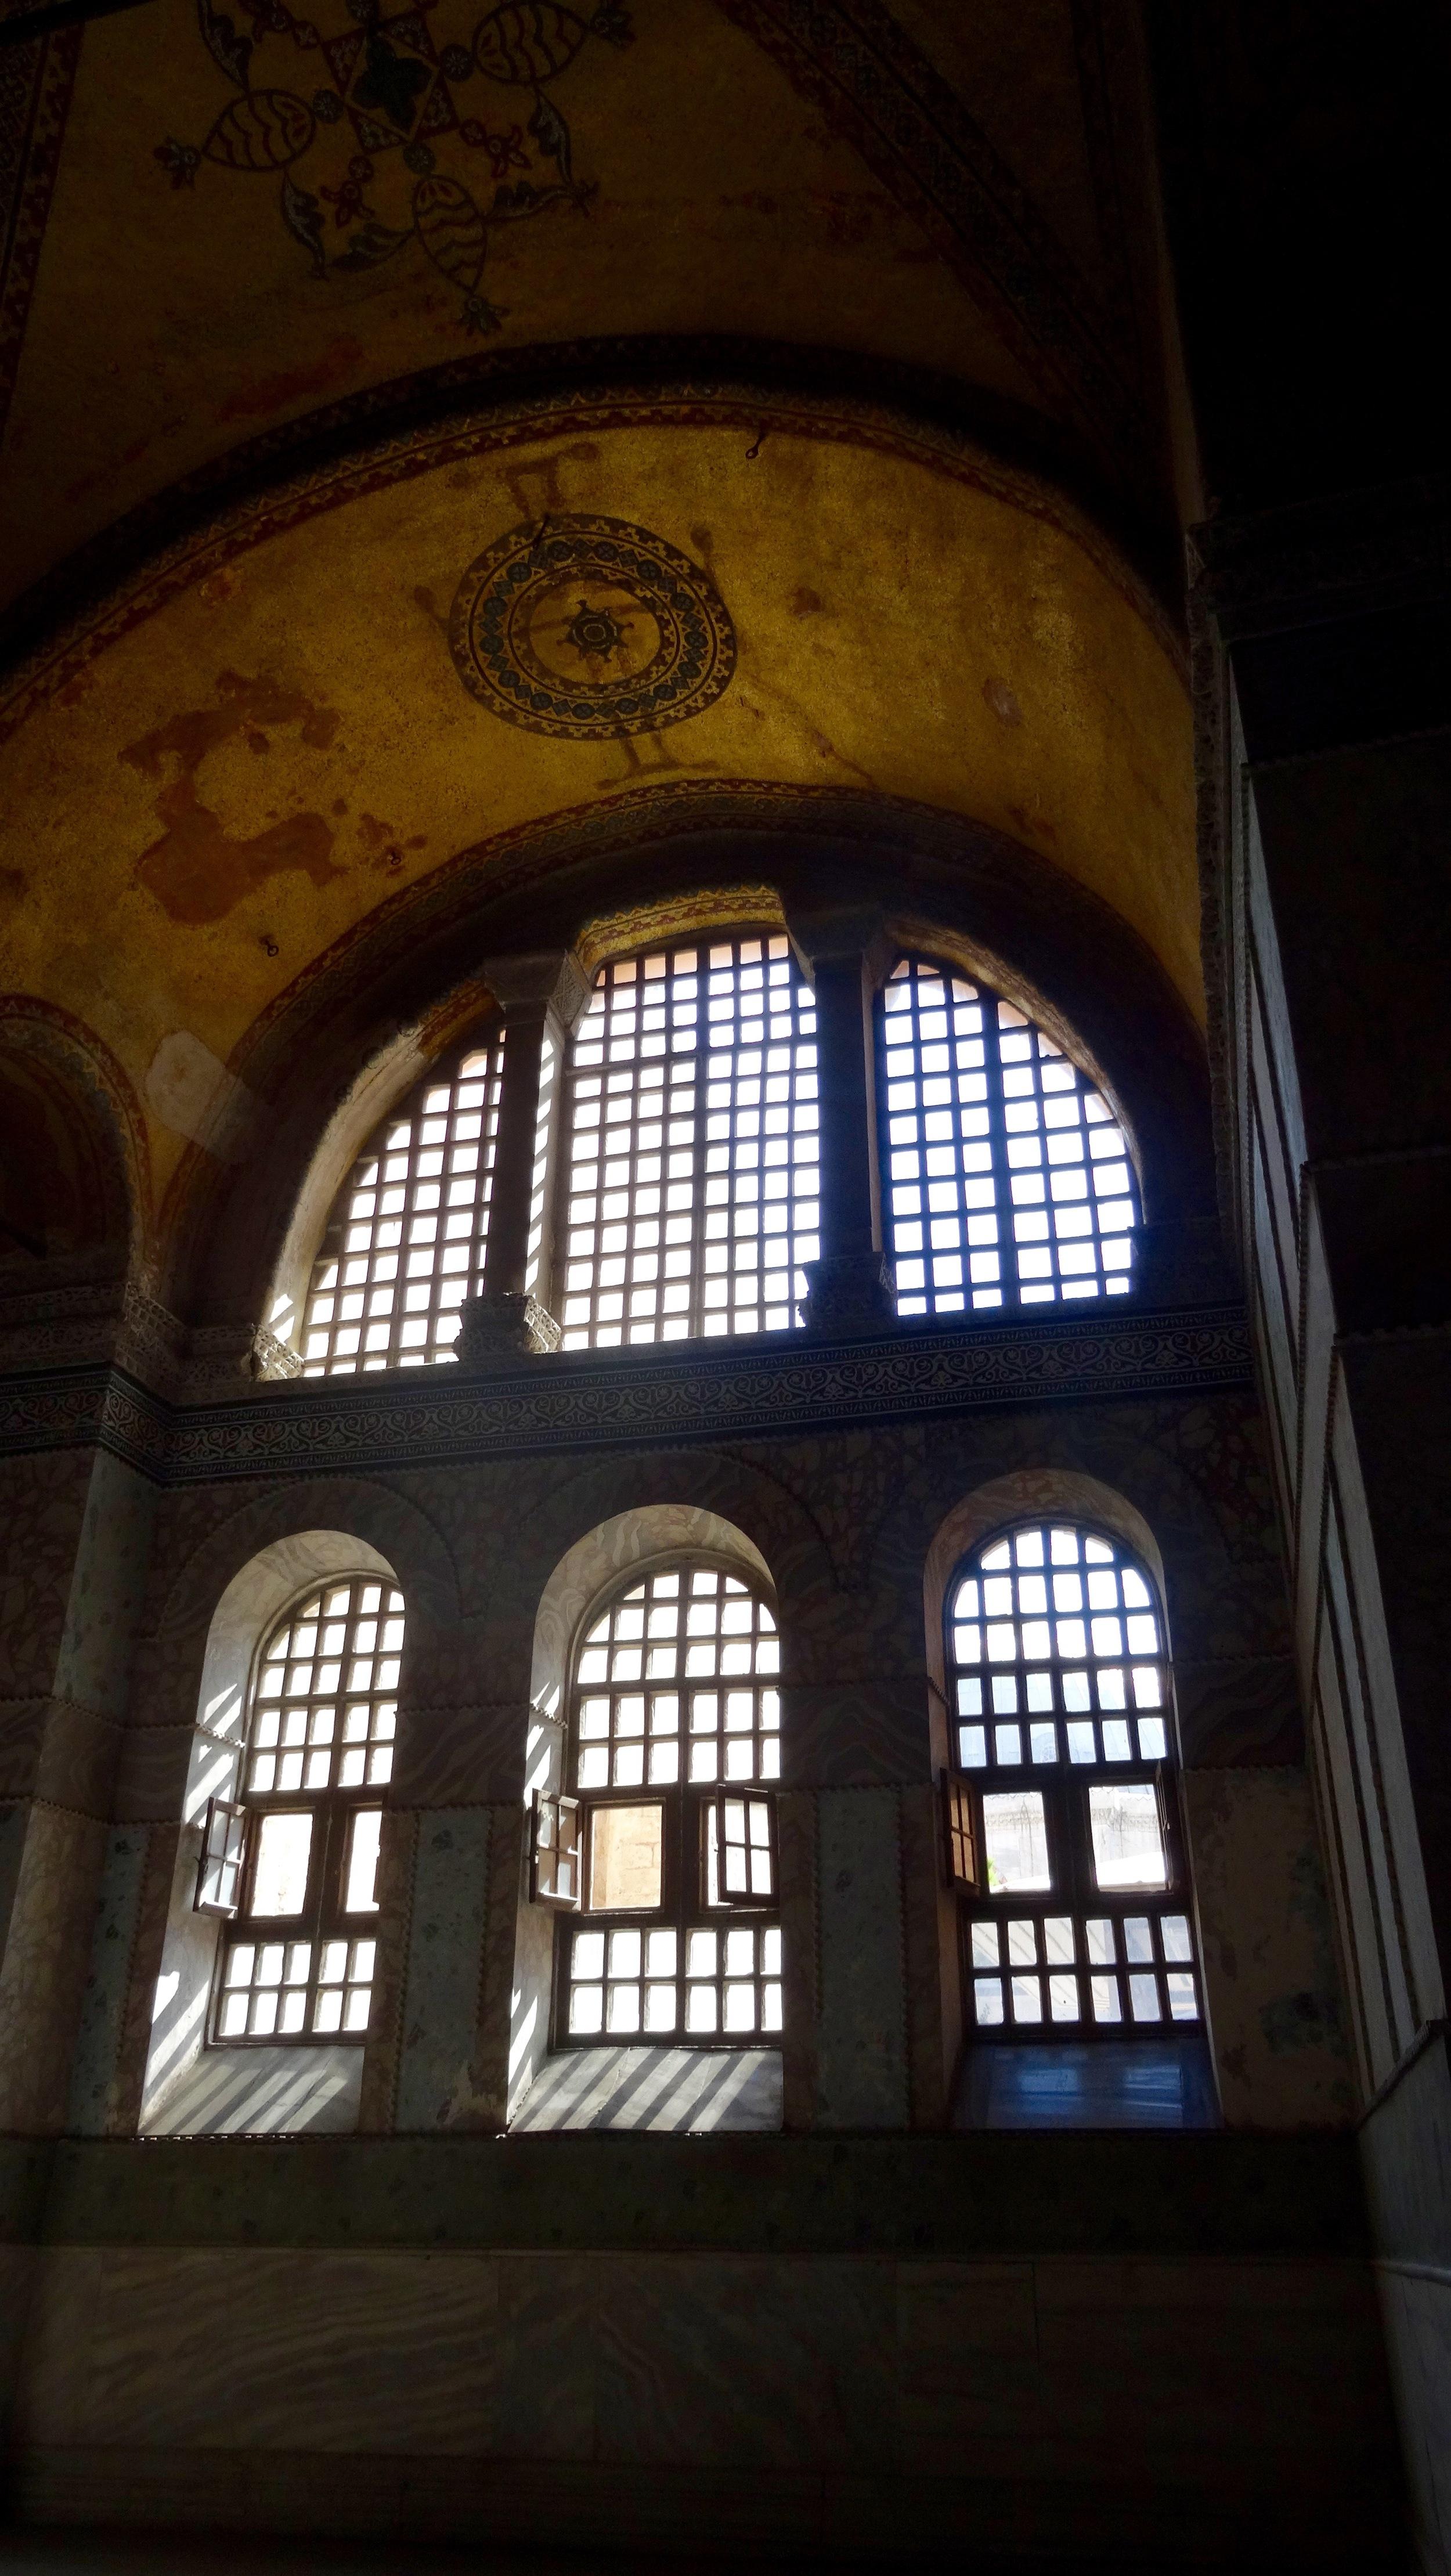 Window. Hagia Sophia (Ayasofya) Museum / Church